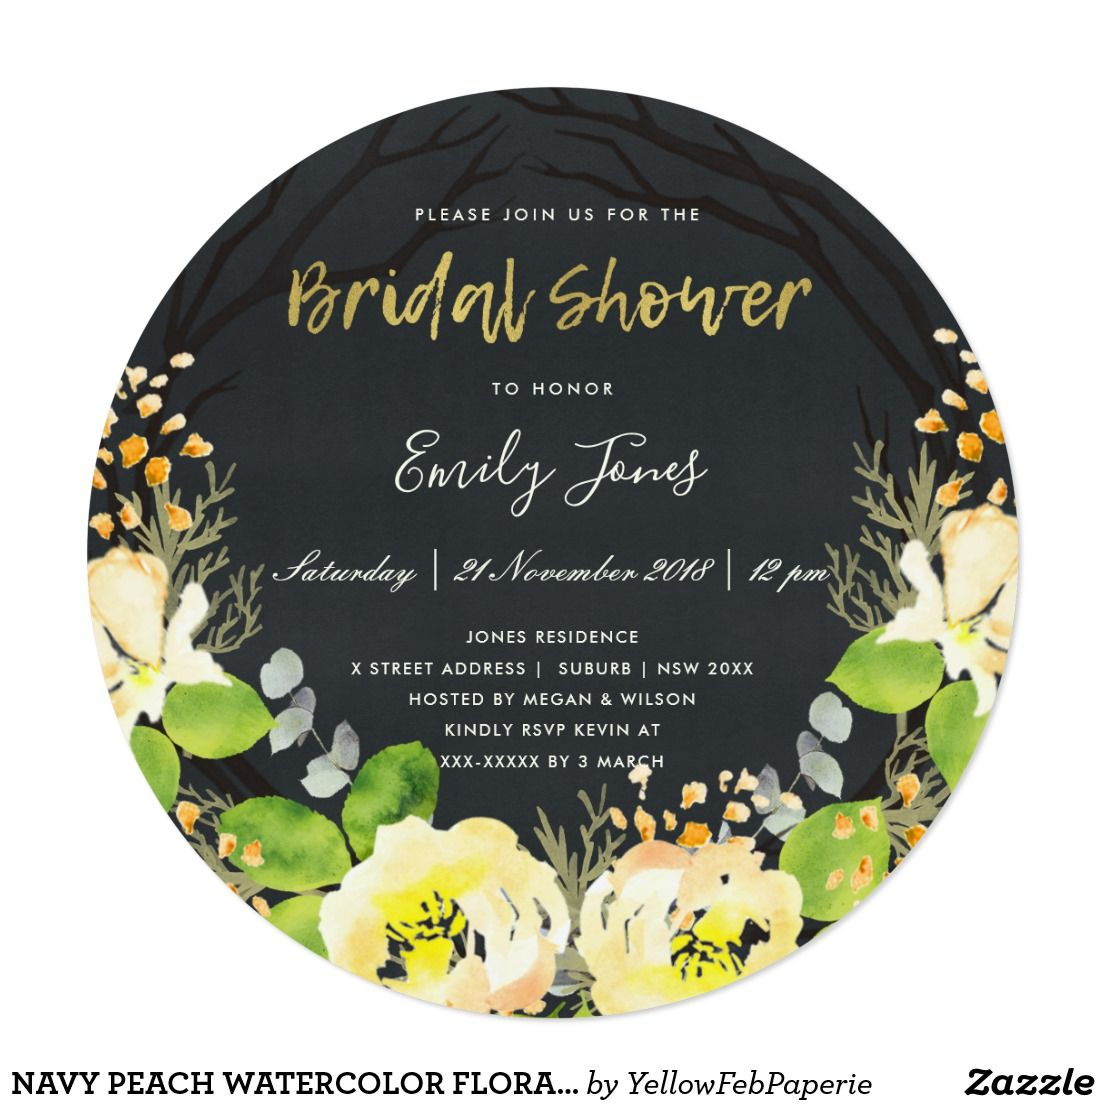 Yellow wedding decorations ideas november 2018 Navy peach watercolor floral wreath bridal shower card